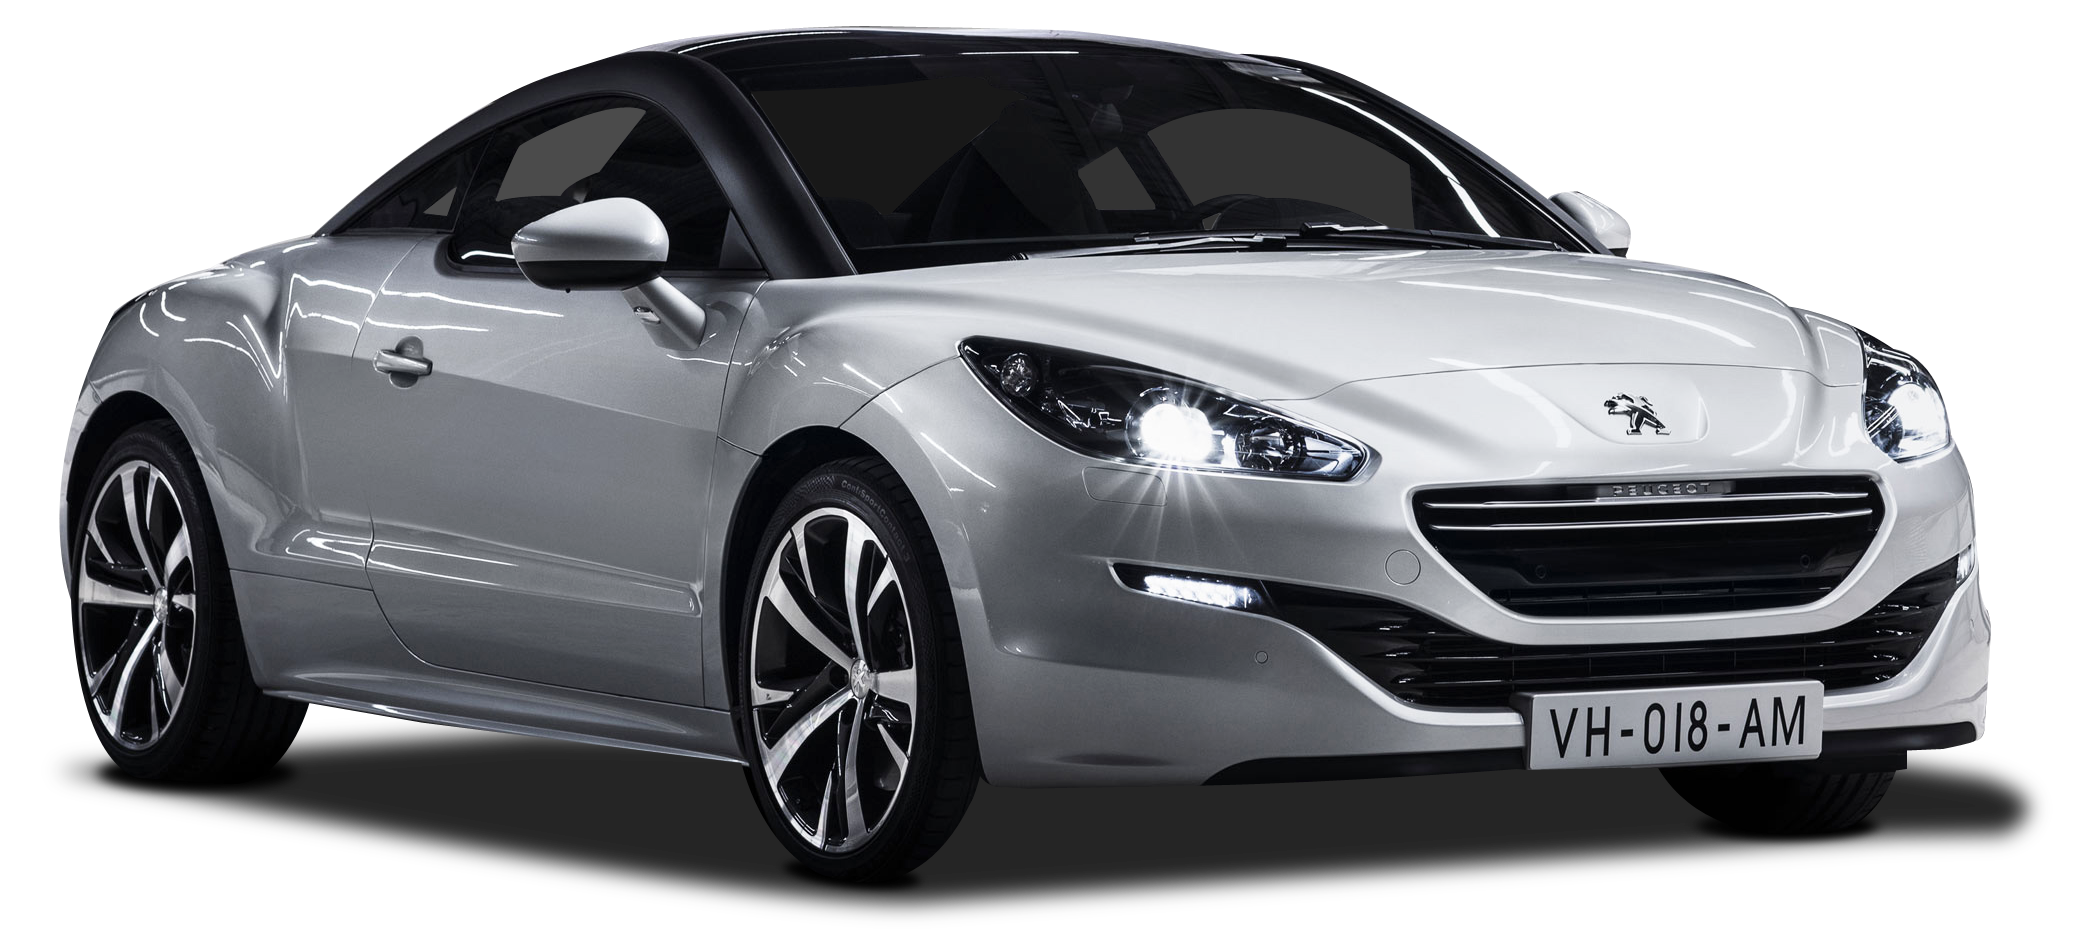 Peugeot PNG Image.